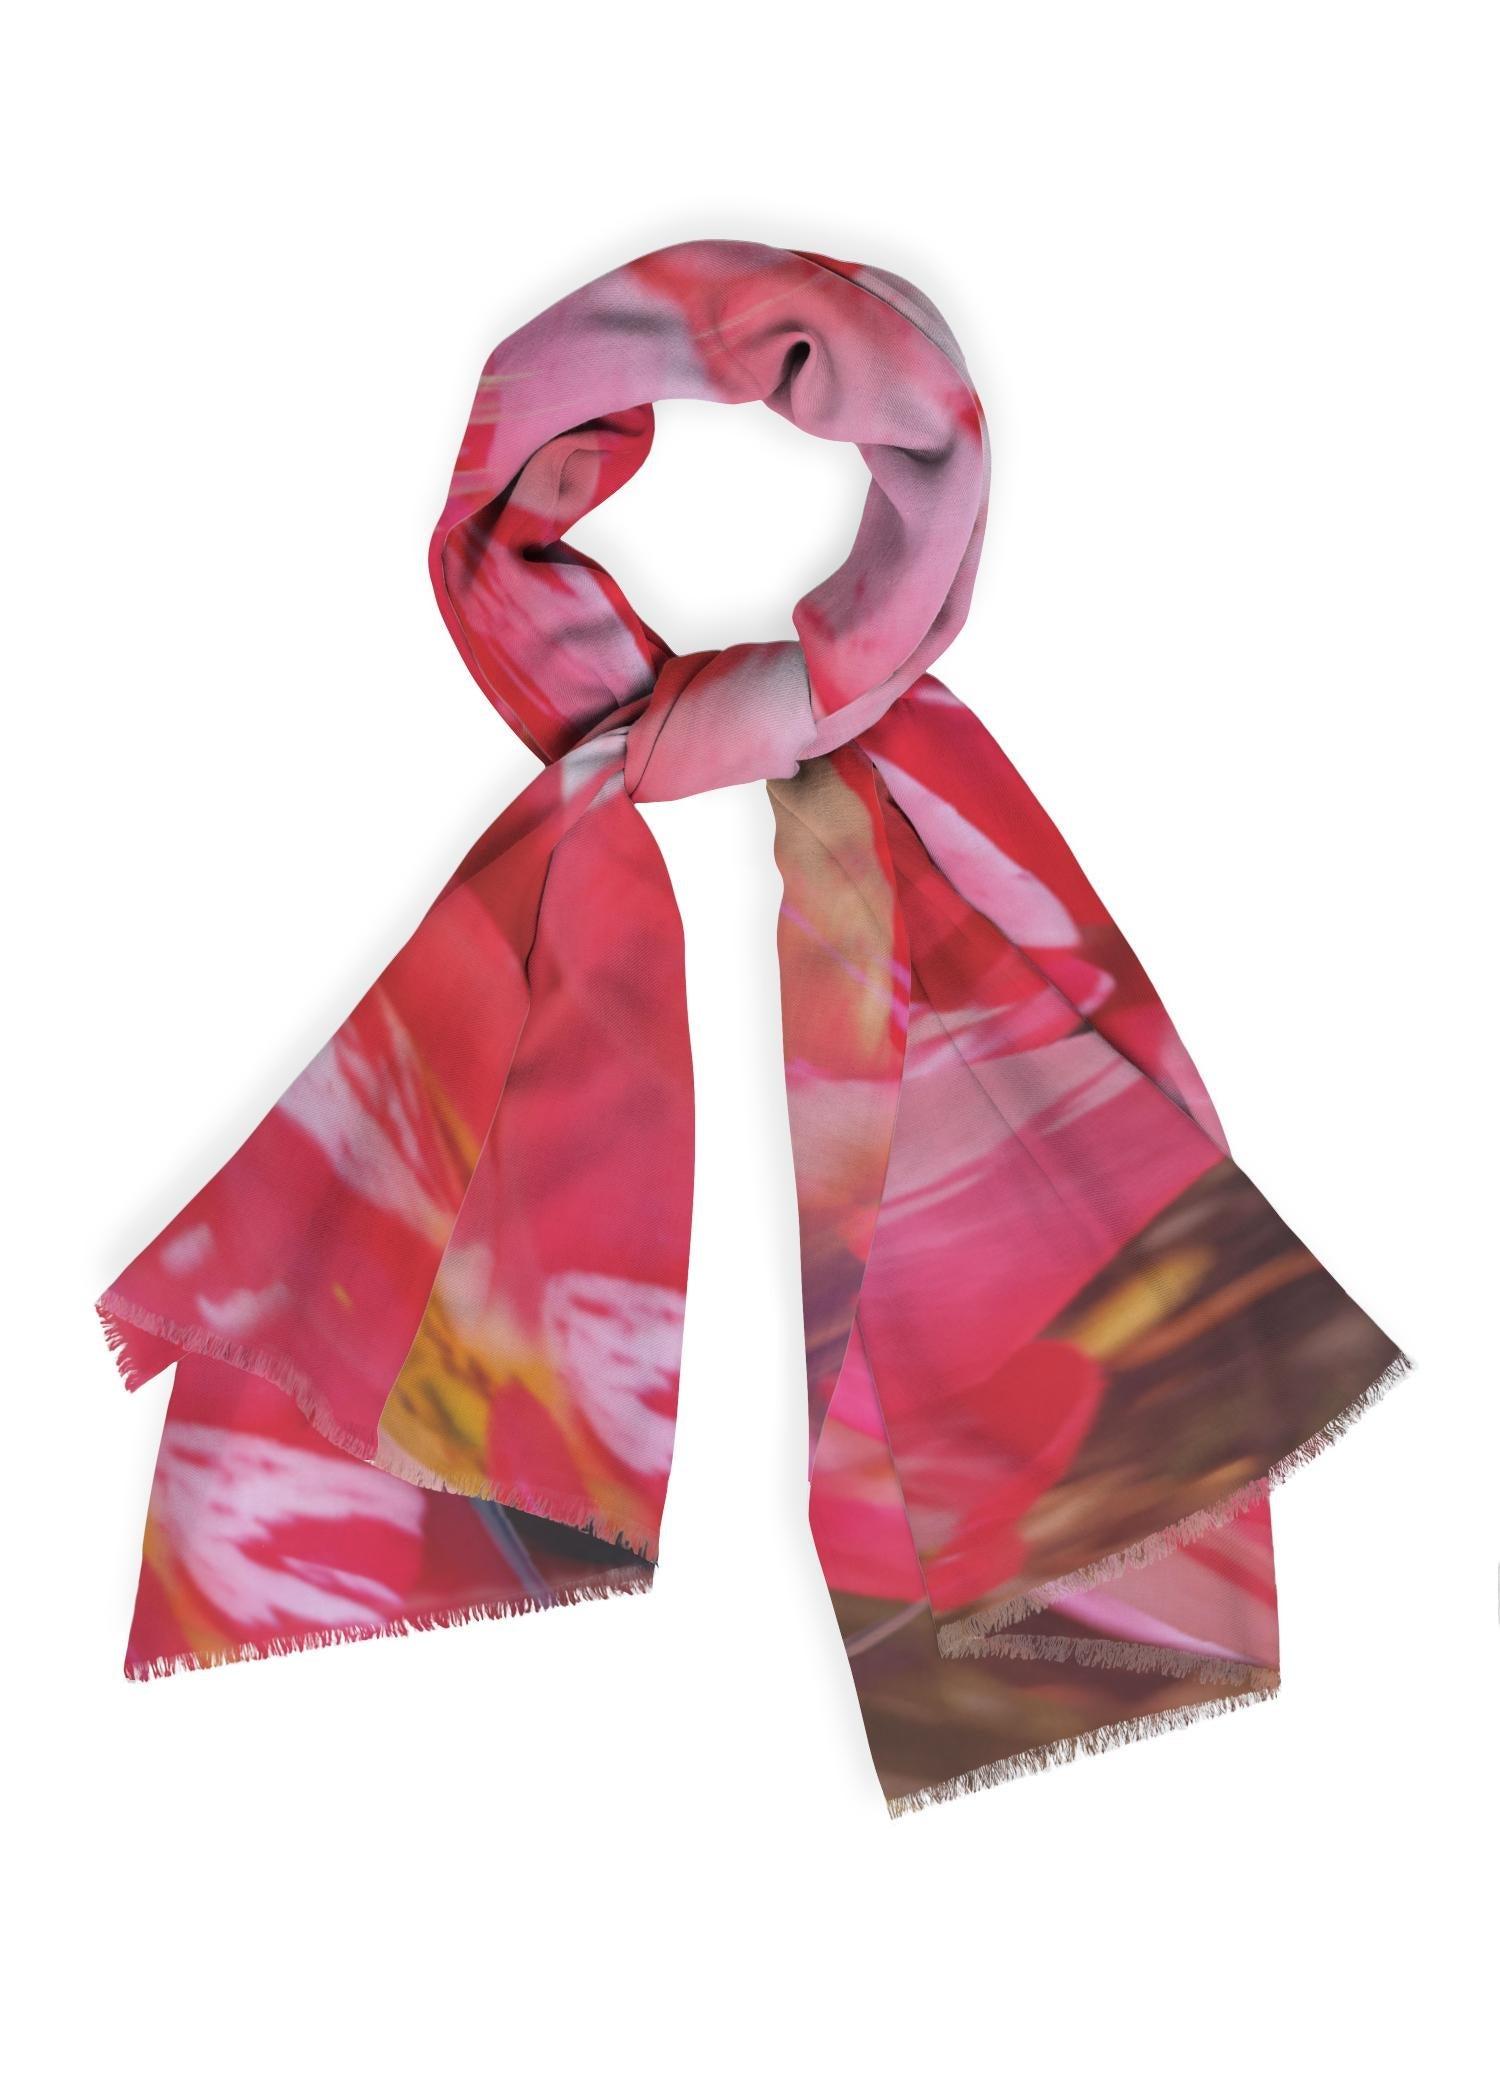 PRIDE Cashmere Silk Scarf - Abstract Garden #3 by PRIDE Original Artist  - Size: One Size